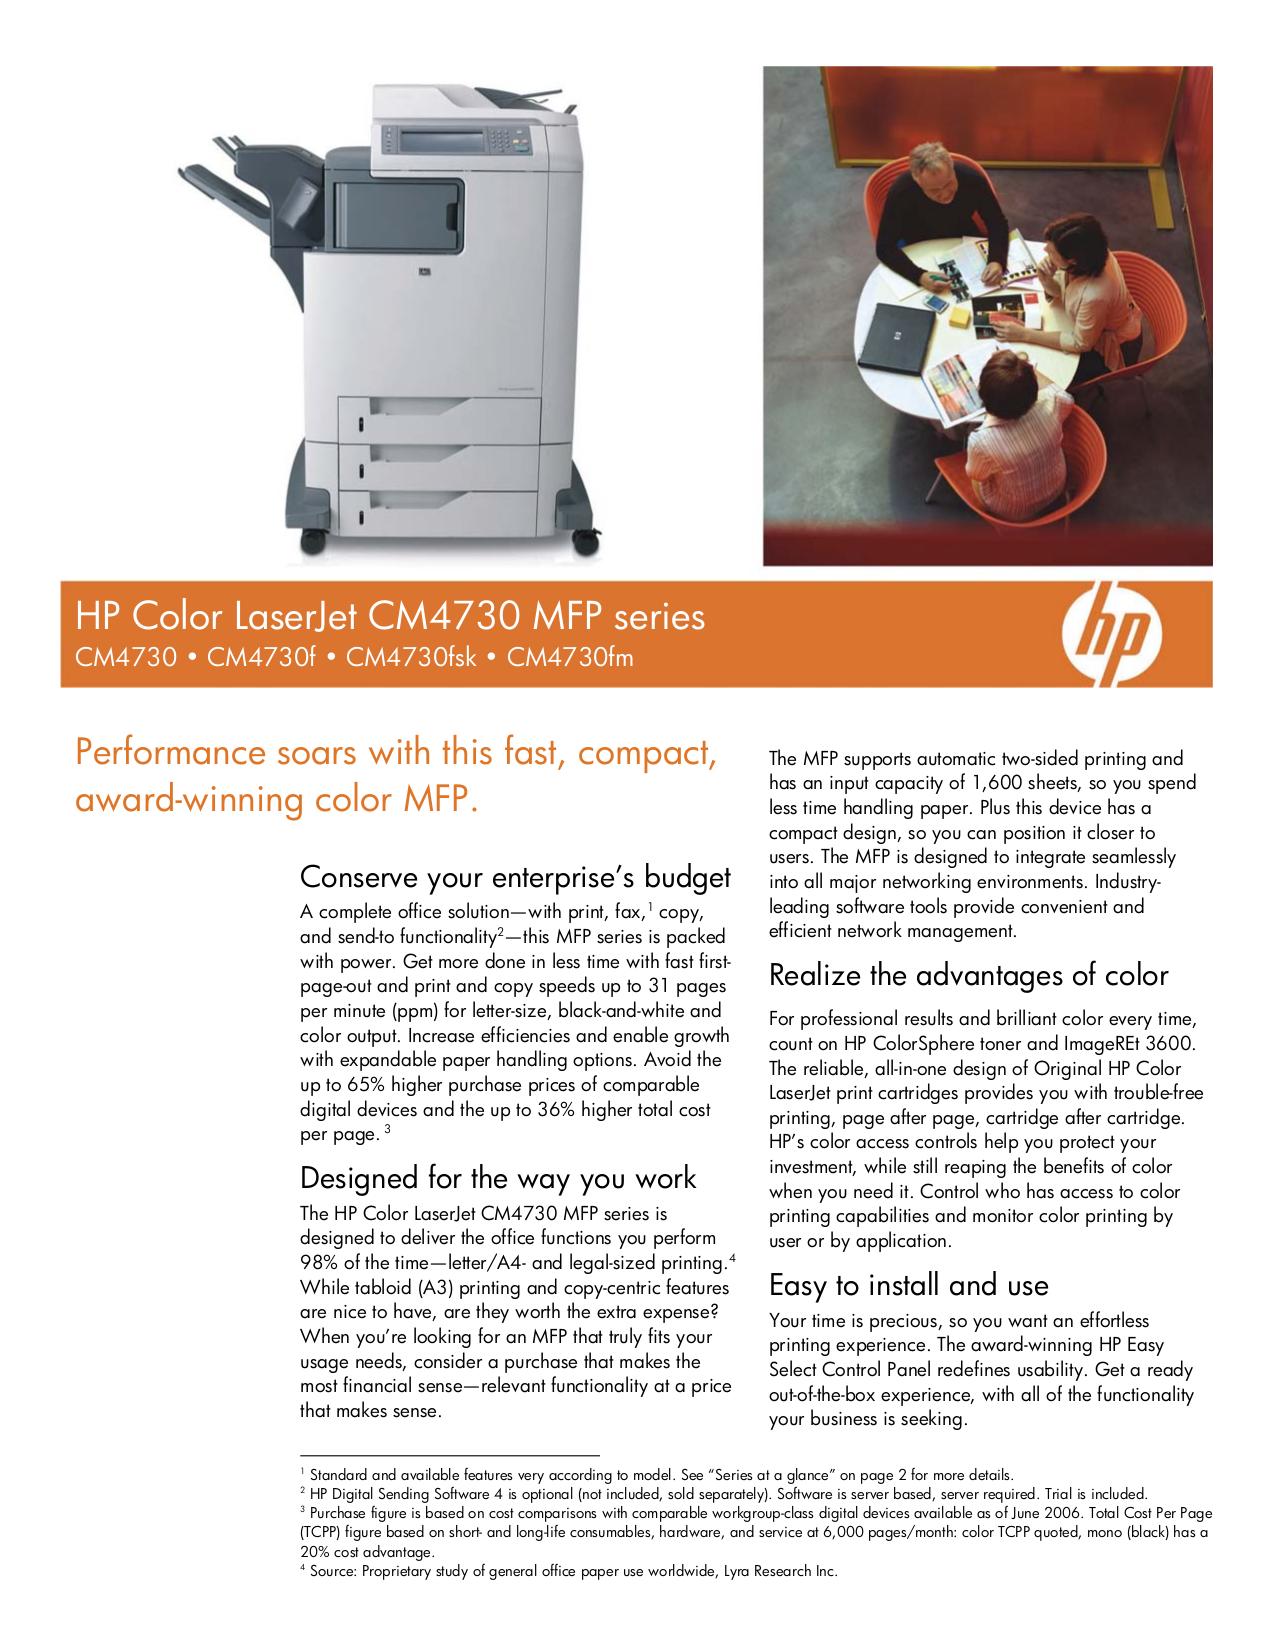 pdf for HP Multifunction Printer Laserjet,Color Laserjet CM4730fsk manual